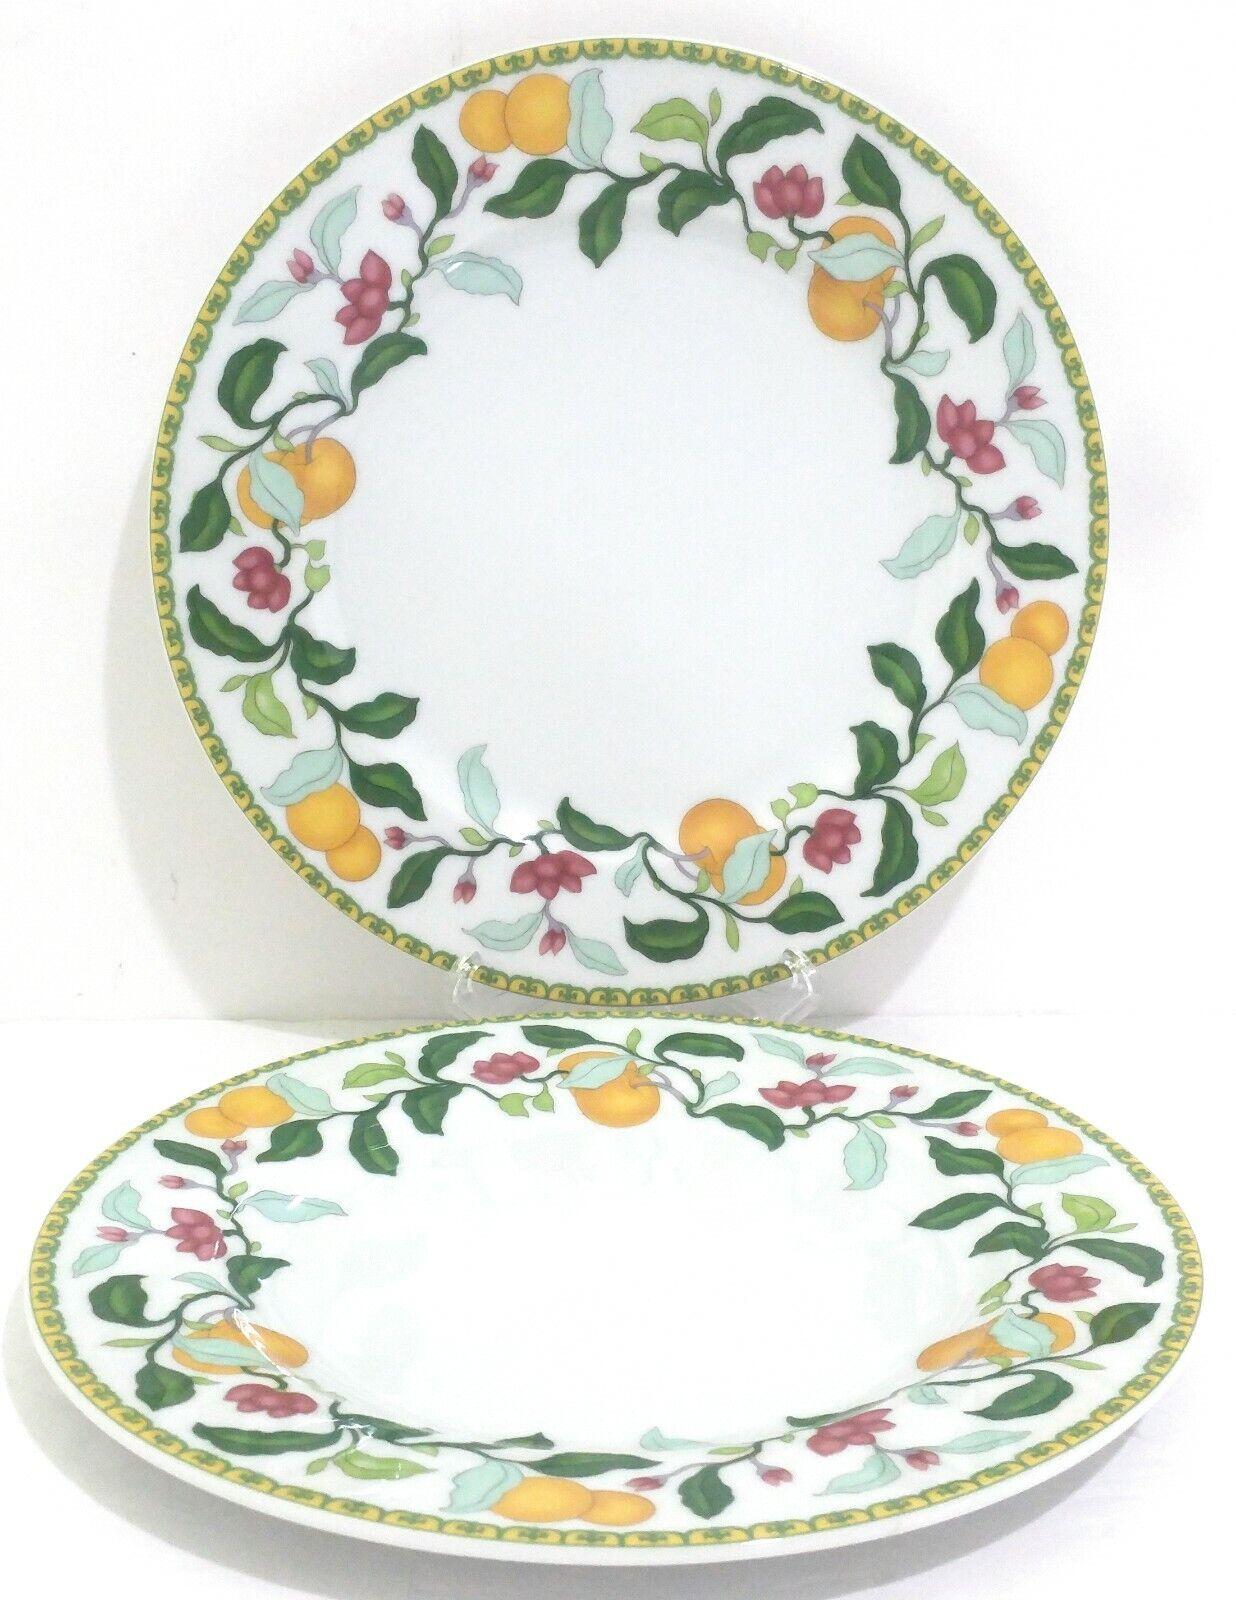 Vista Alegre ALGARVE Dessert Salade Plate-Lot de 2